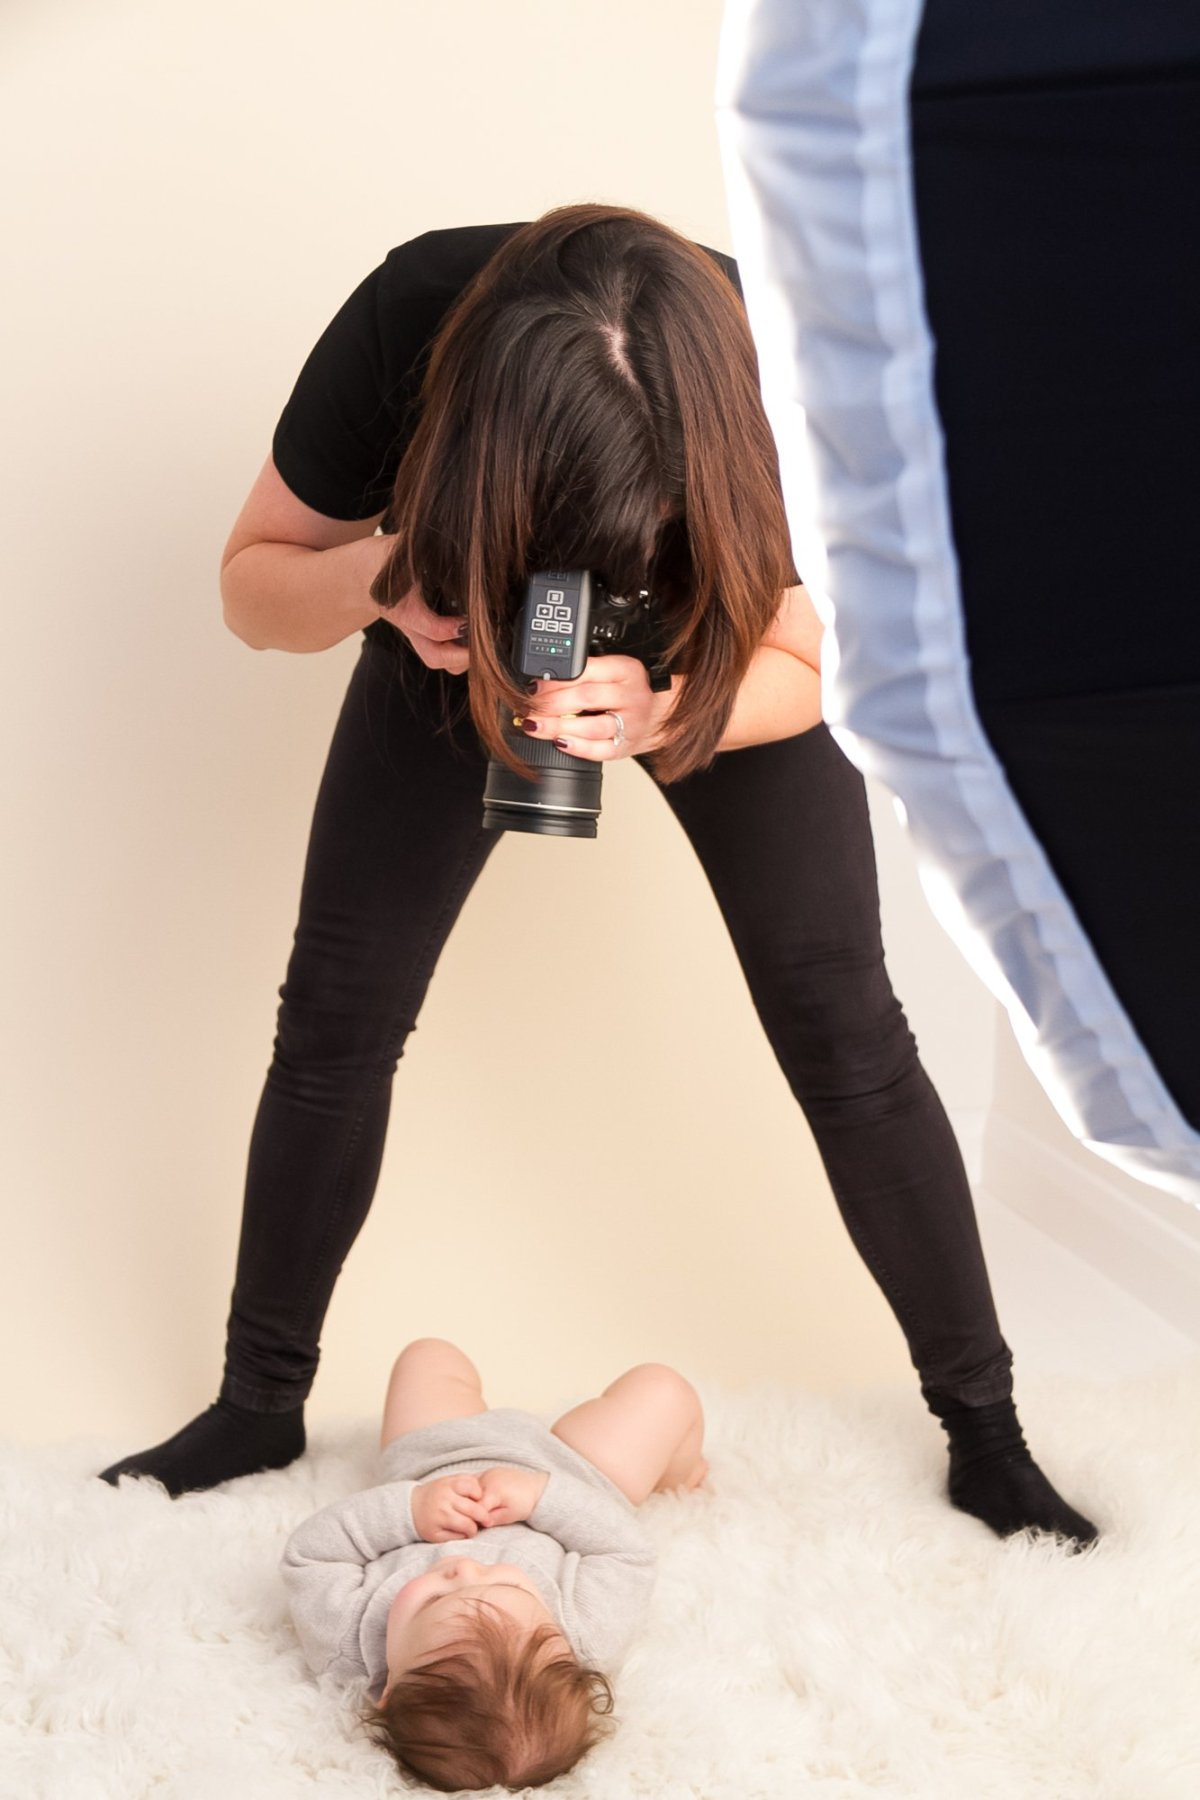 Baby photo shoot at london studio